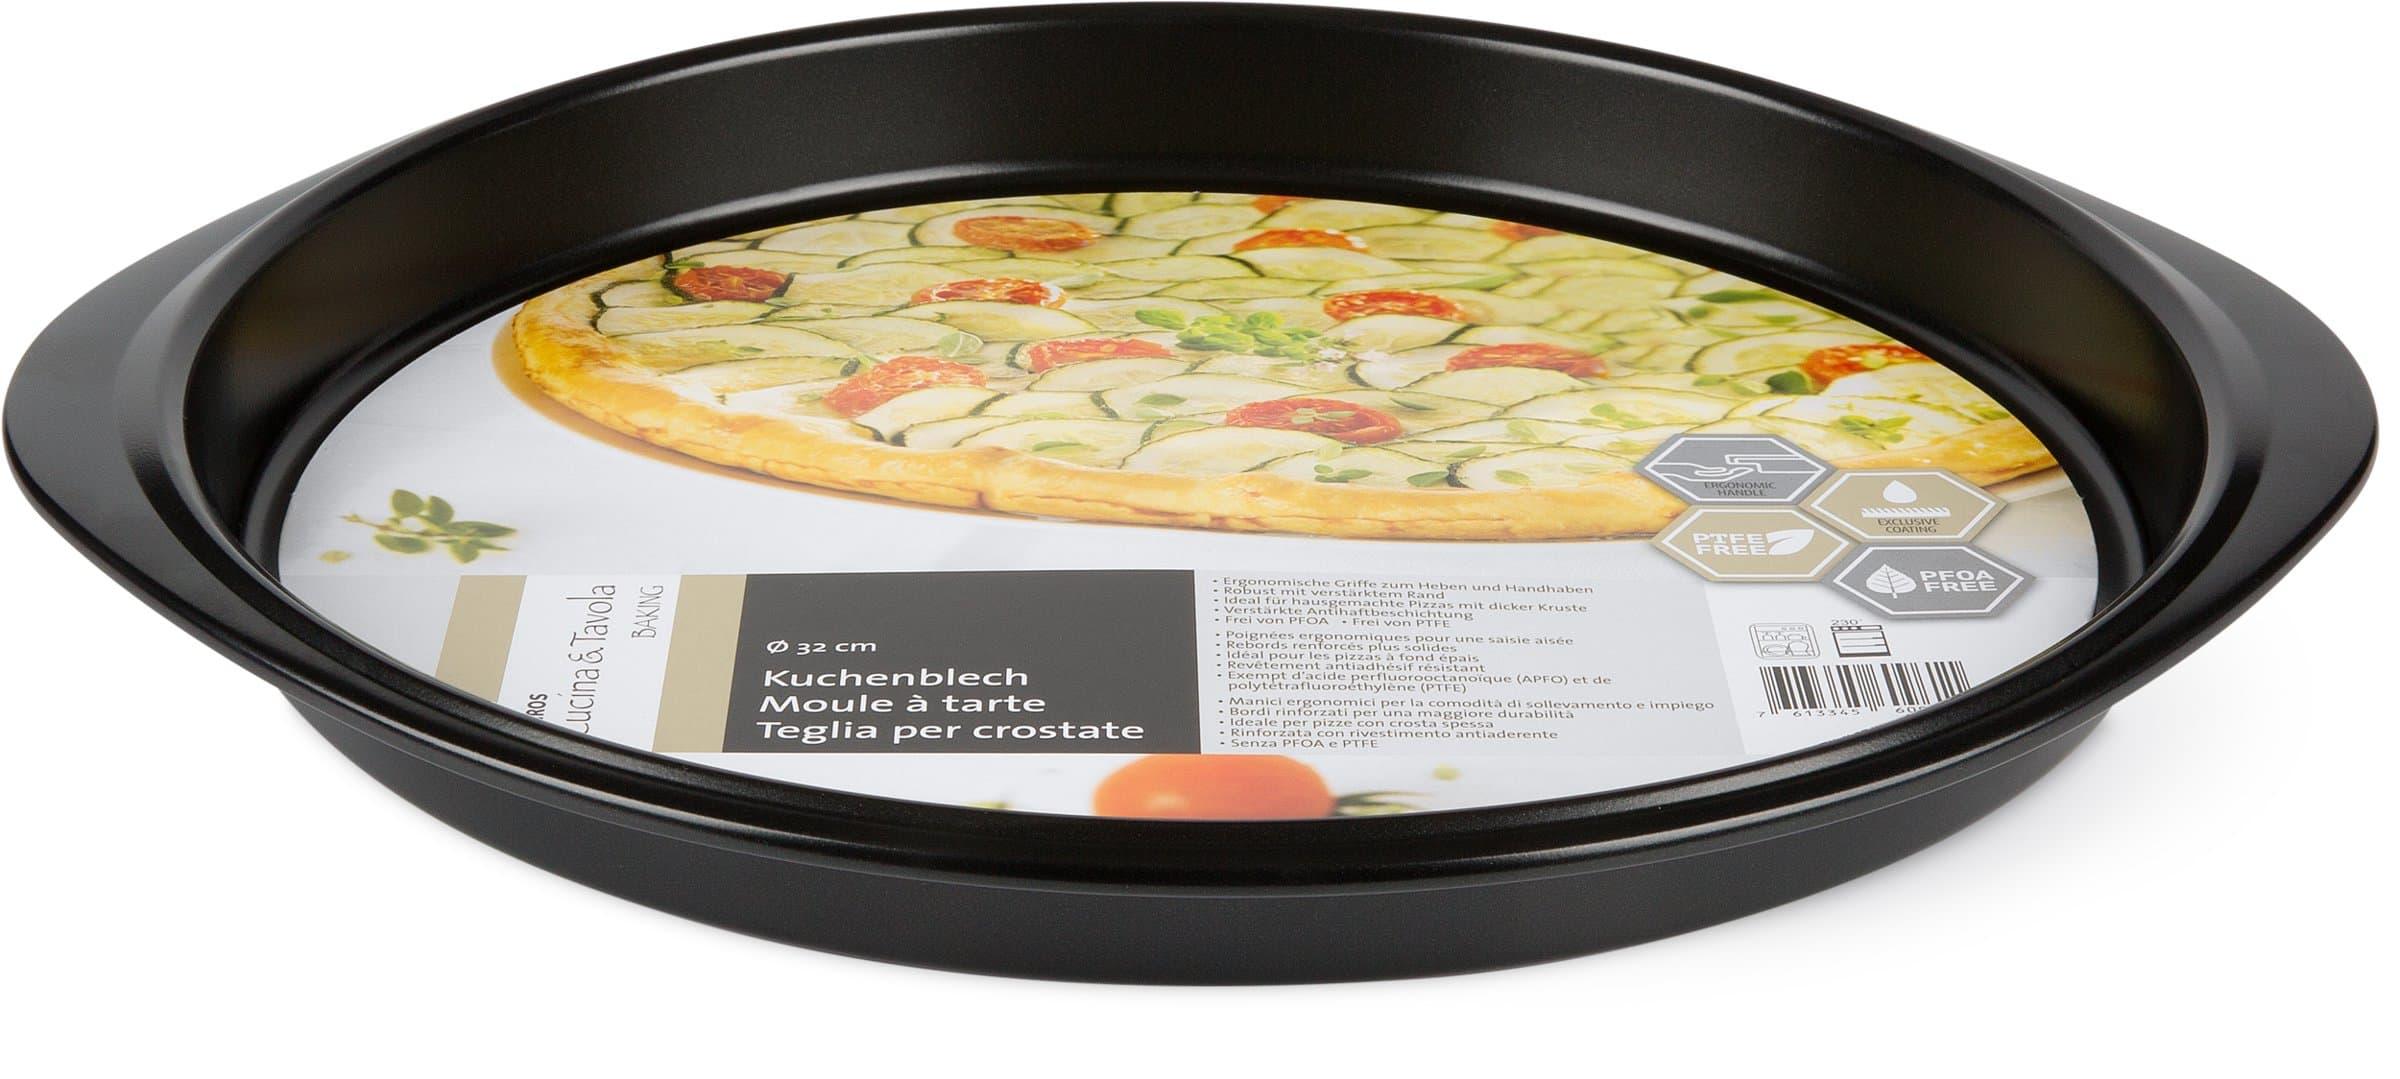 Cucina tavola cucina tavola kuchenblech migros for Tavola cucina